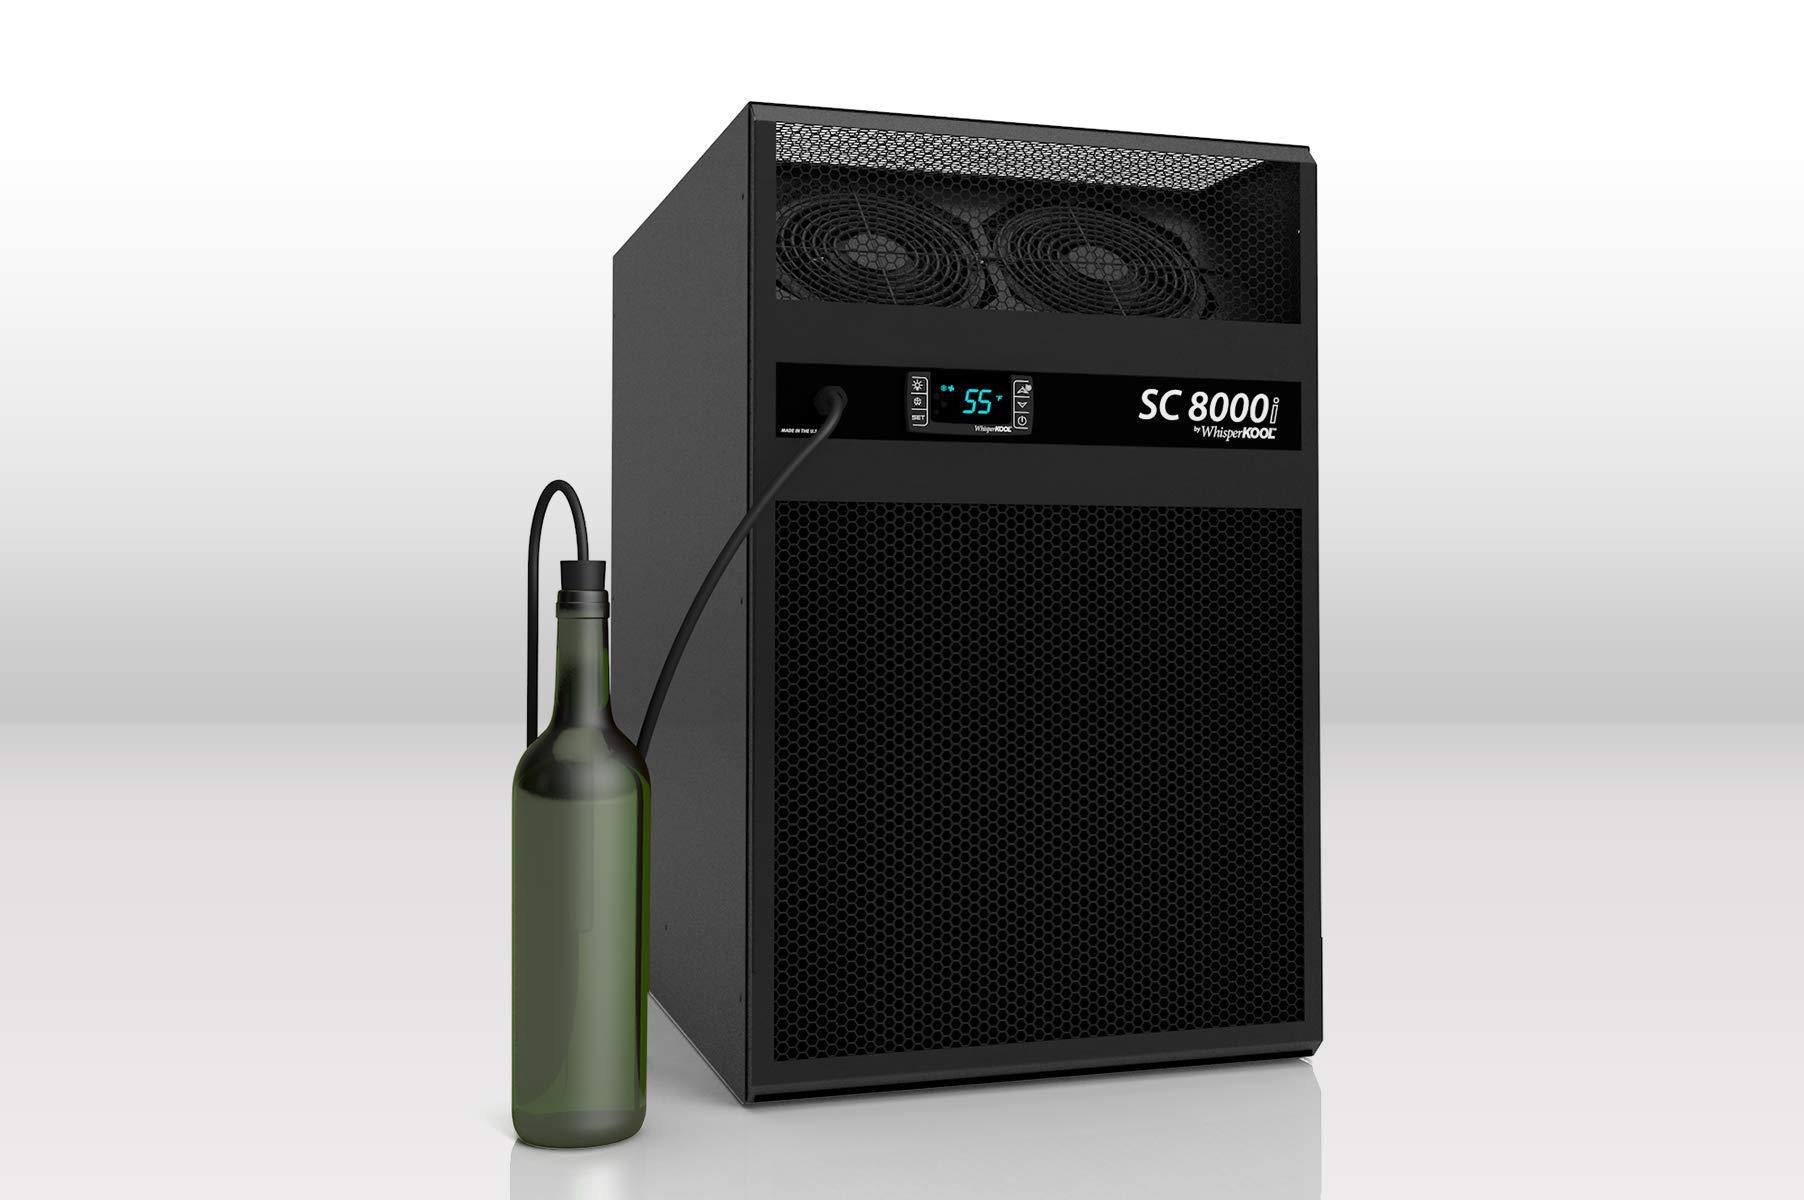 WhisperKOOL SC 8000i Wine Cooling Unit by WhisperKOOL